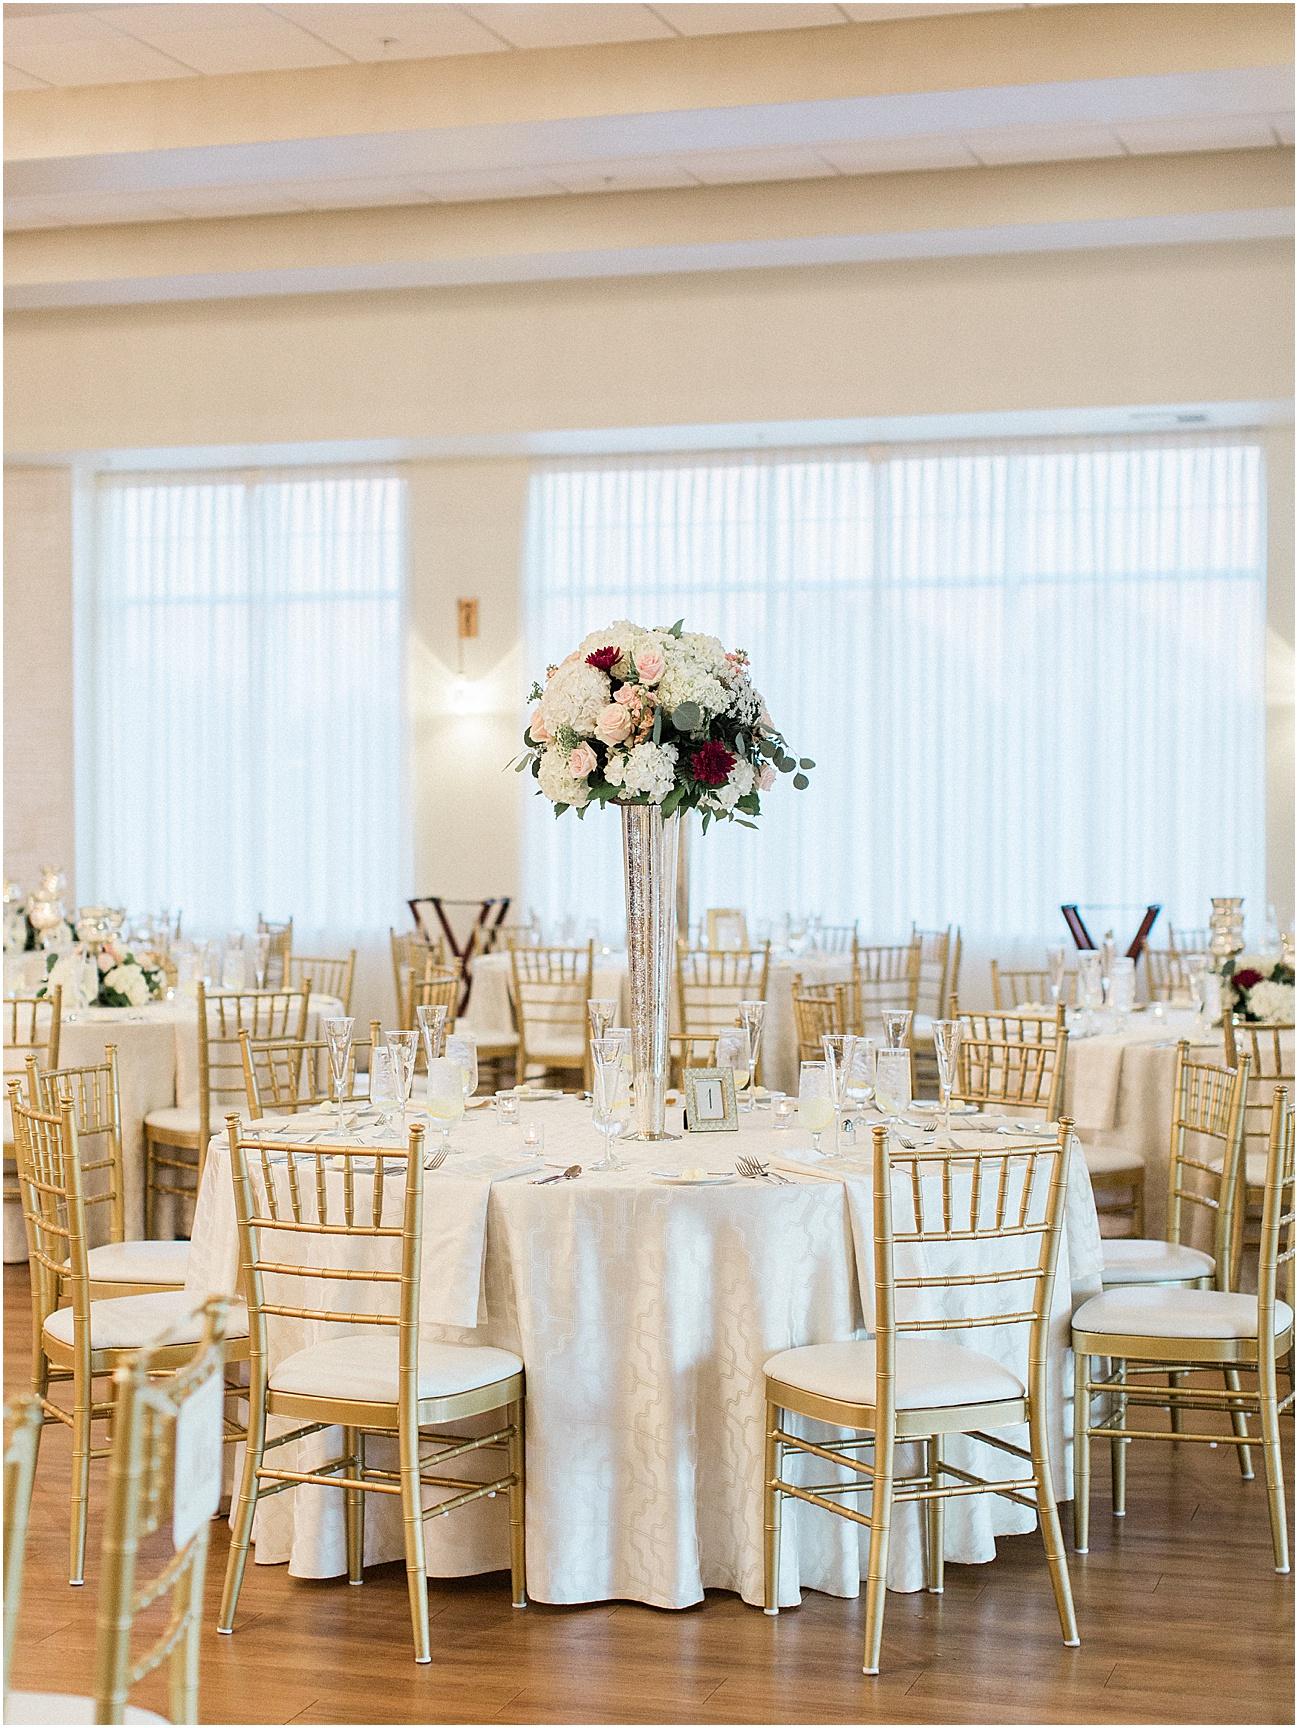 shannon_daniel_dan_atlantic_resort_saint_marys_st_mary_church_fall_newport_catholic_irish_cape_cod_boston_wedding_photographer_meredith_jane_photography_photo_1645.jpg